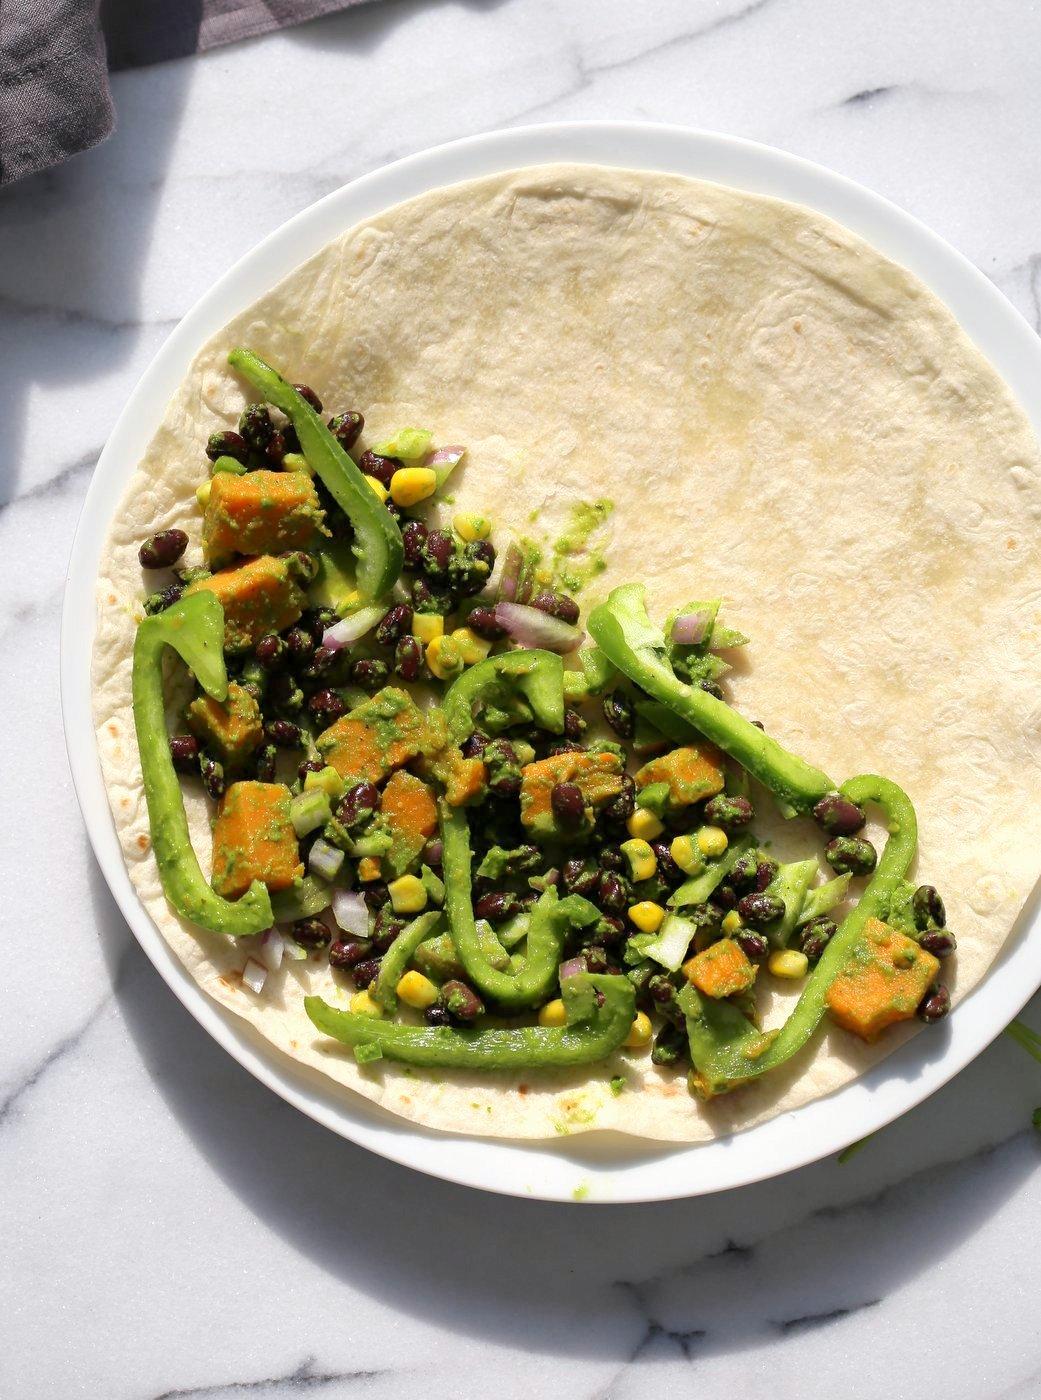 Chimichurri Sweet Potato Black Bean Quesadilla - 10 minute Grilled Quesadillas with Beans. Roasted Sweet Potatoes, Peppers and Chimichurri. #Vegan #Nutfree #Soyfree #Recipe. Can be #Glutenfree #veganricha ! VeganRicha.com